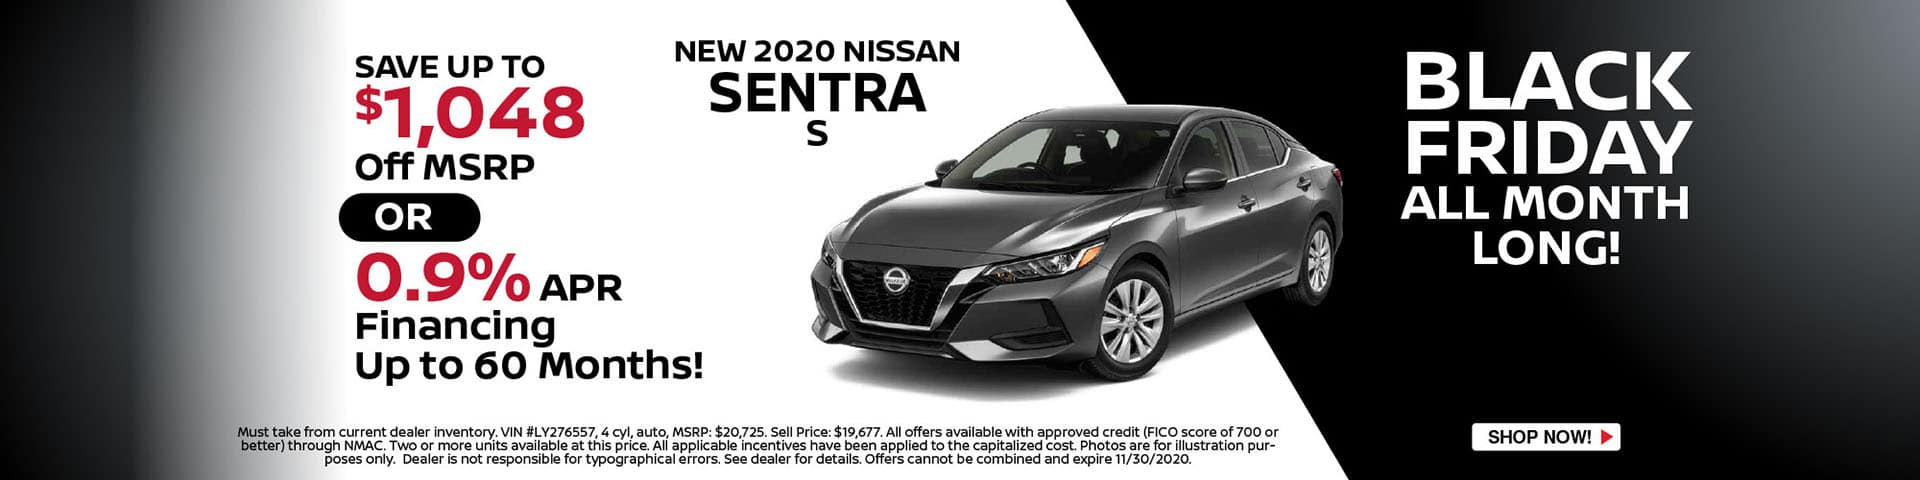 2020 Nissan Sentra - Save $1,048 or 0.9% APR